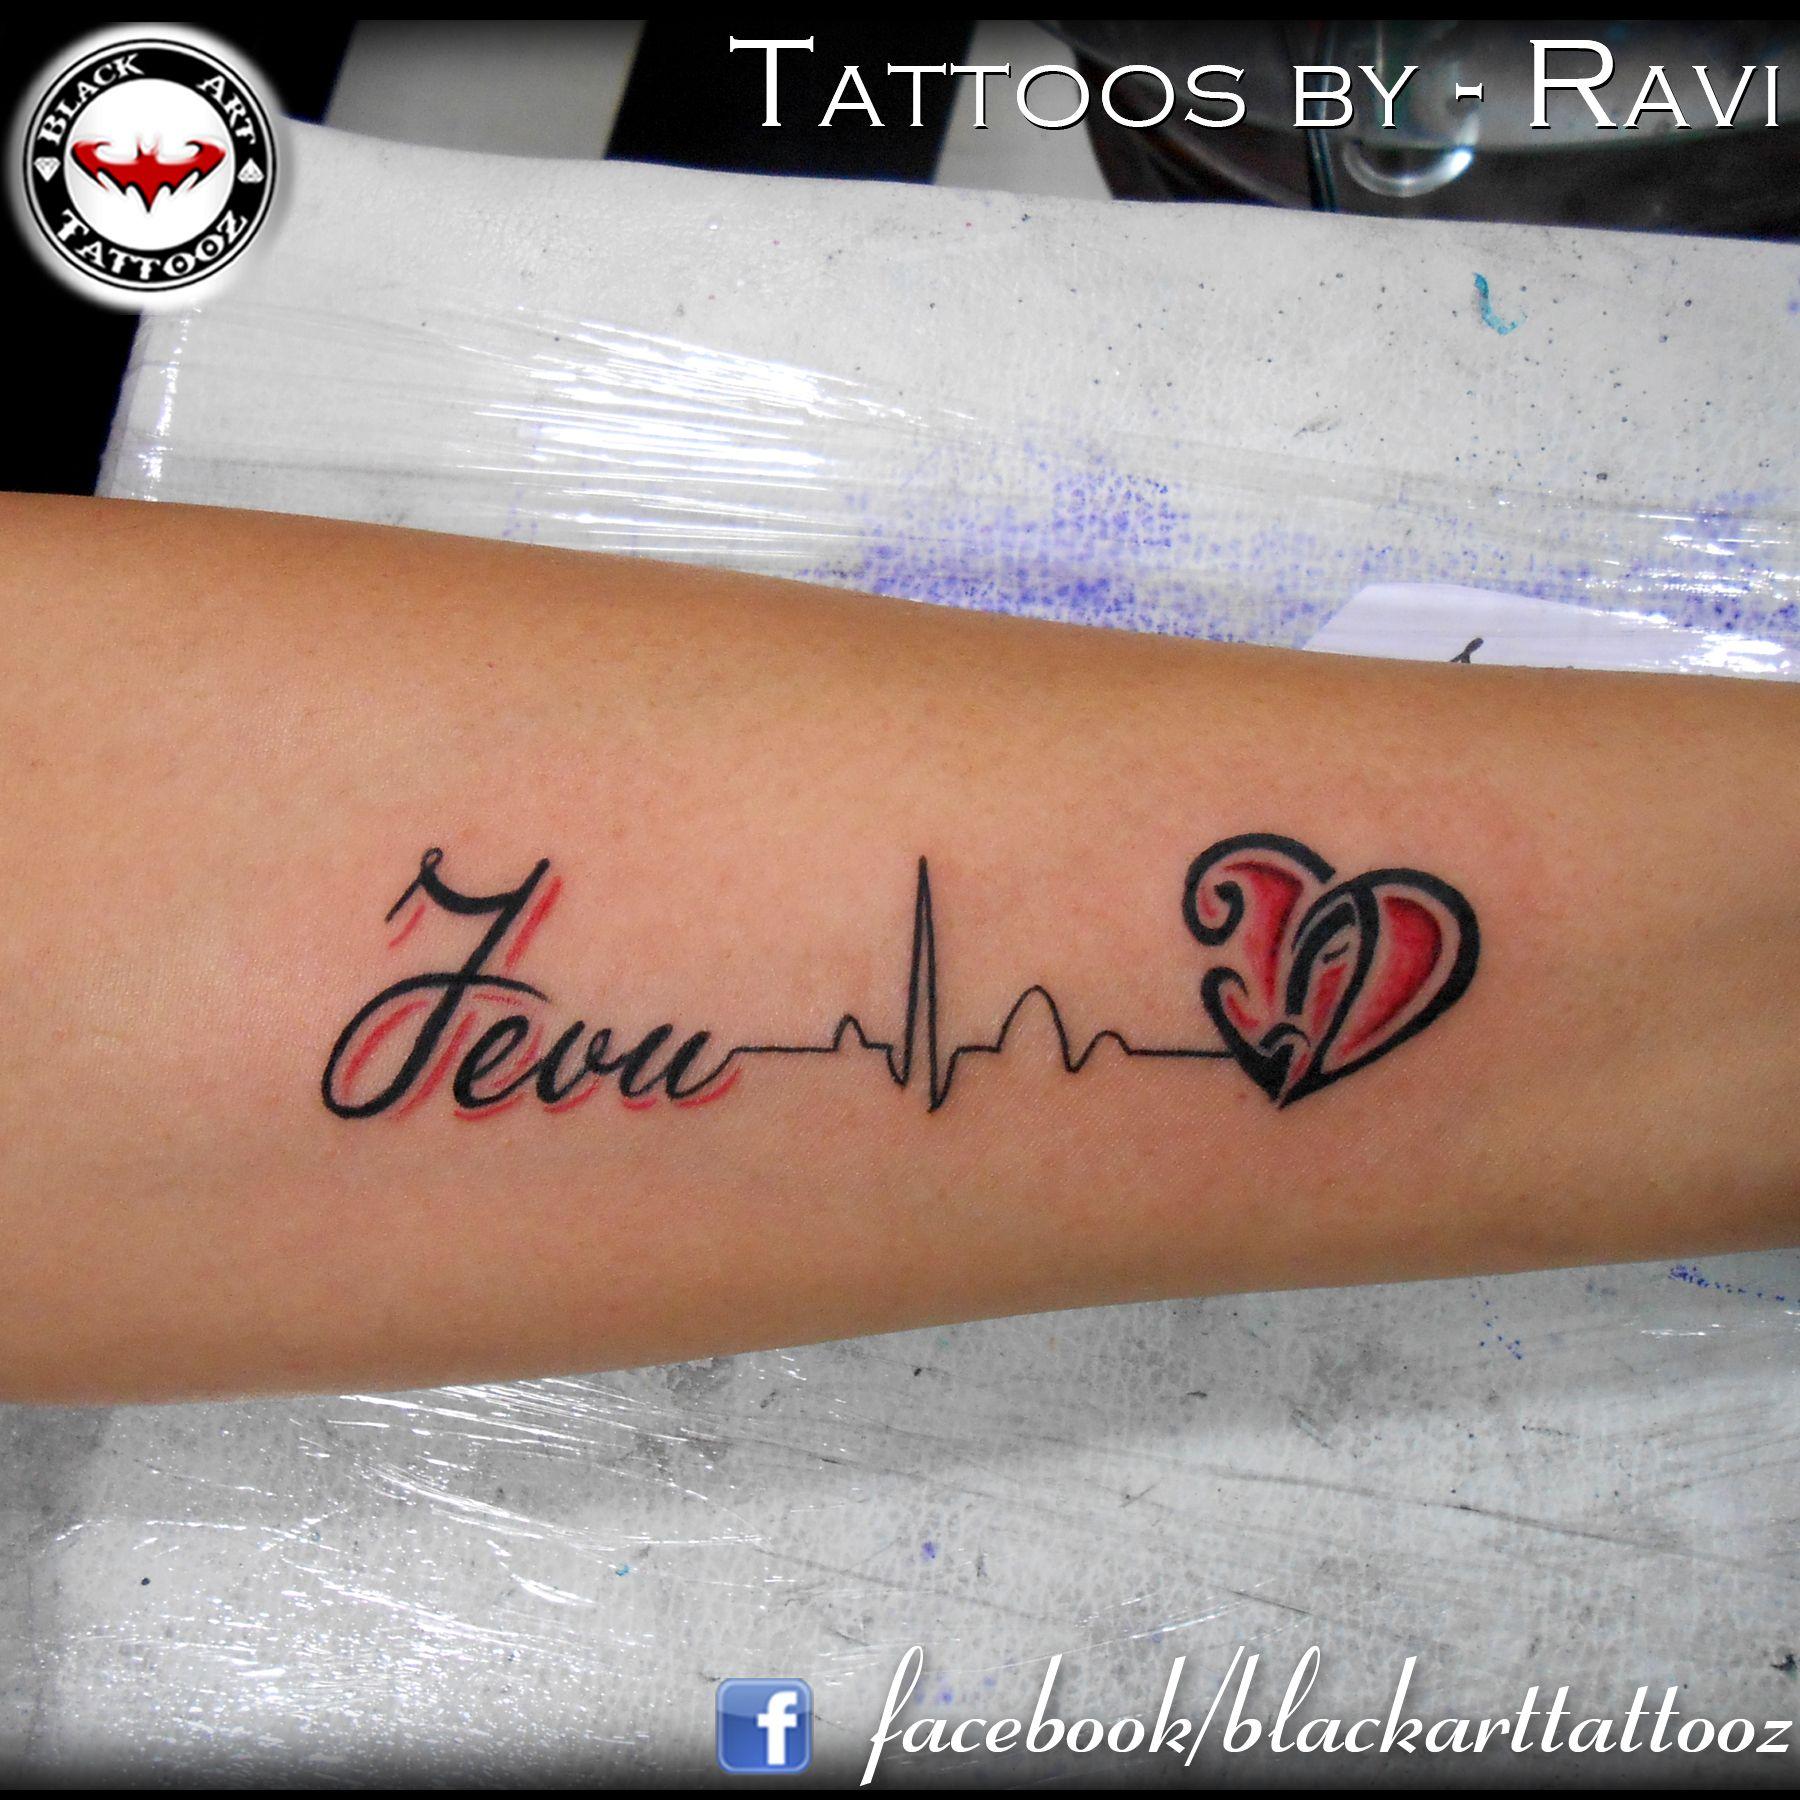 Custom Designed By Ravi Gohel At Black Art Tattooz Tattoo Tattooing Tattooed Tattooedgirl Girl Tattoowithgirl Ink Red Tattoos Tattoos Tattoo Designs